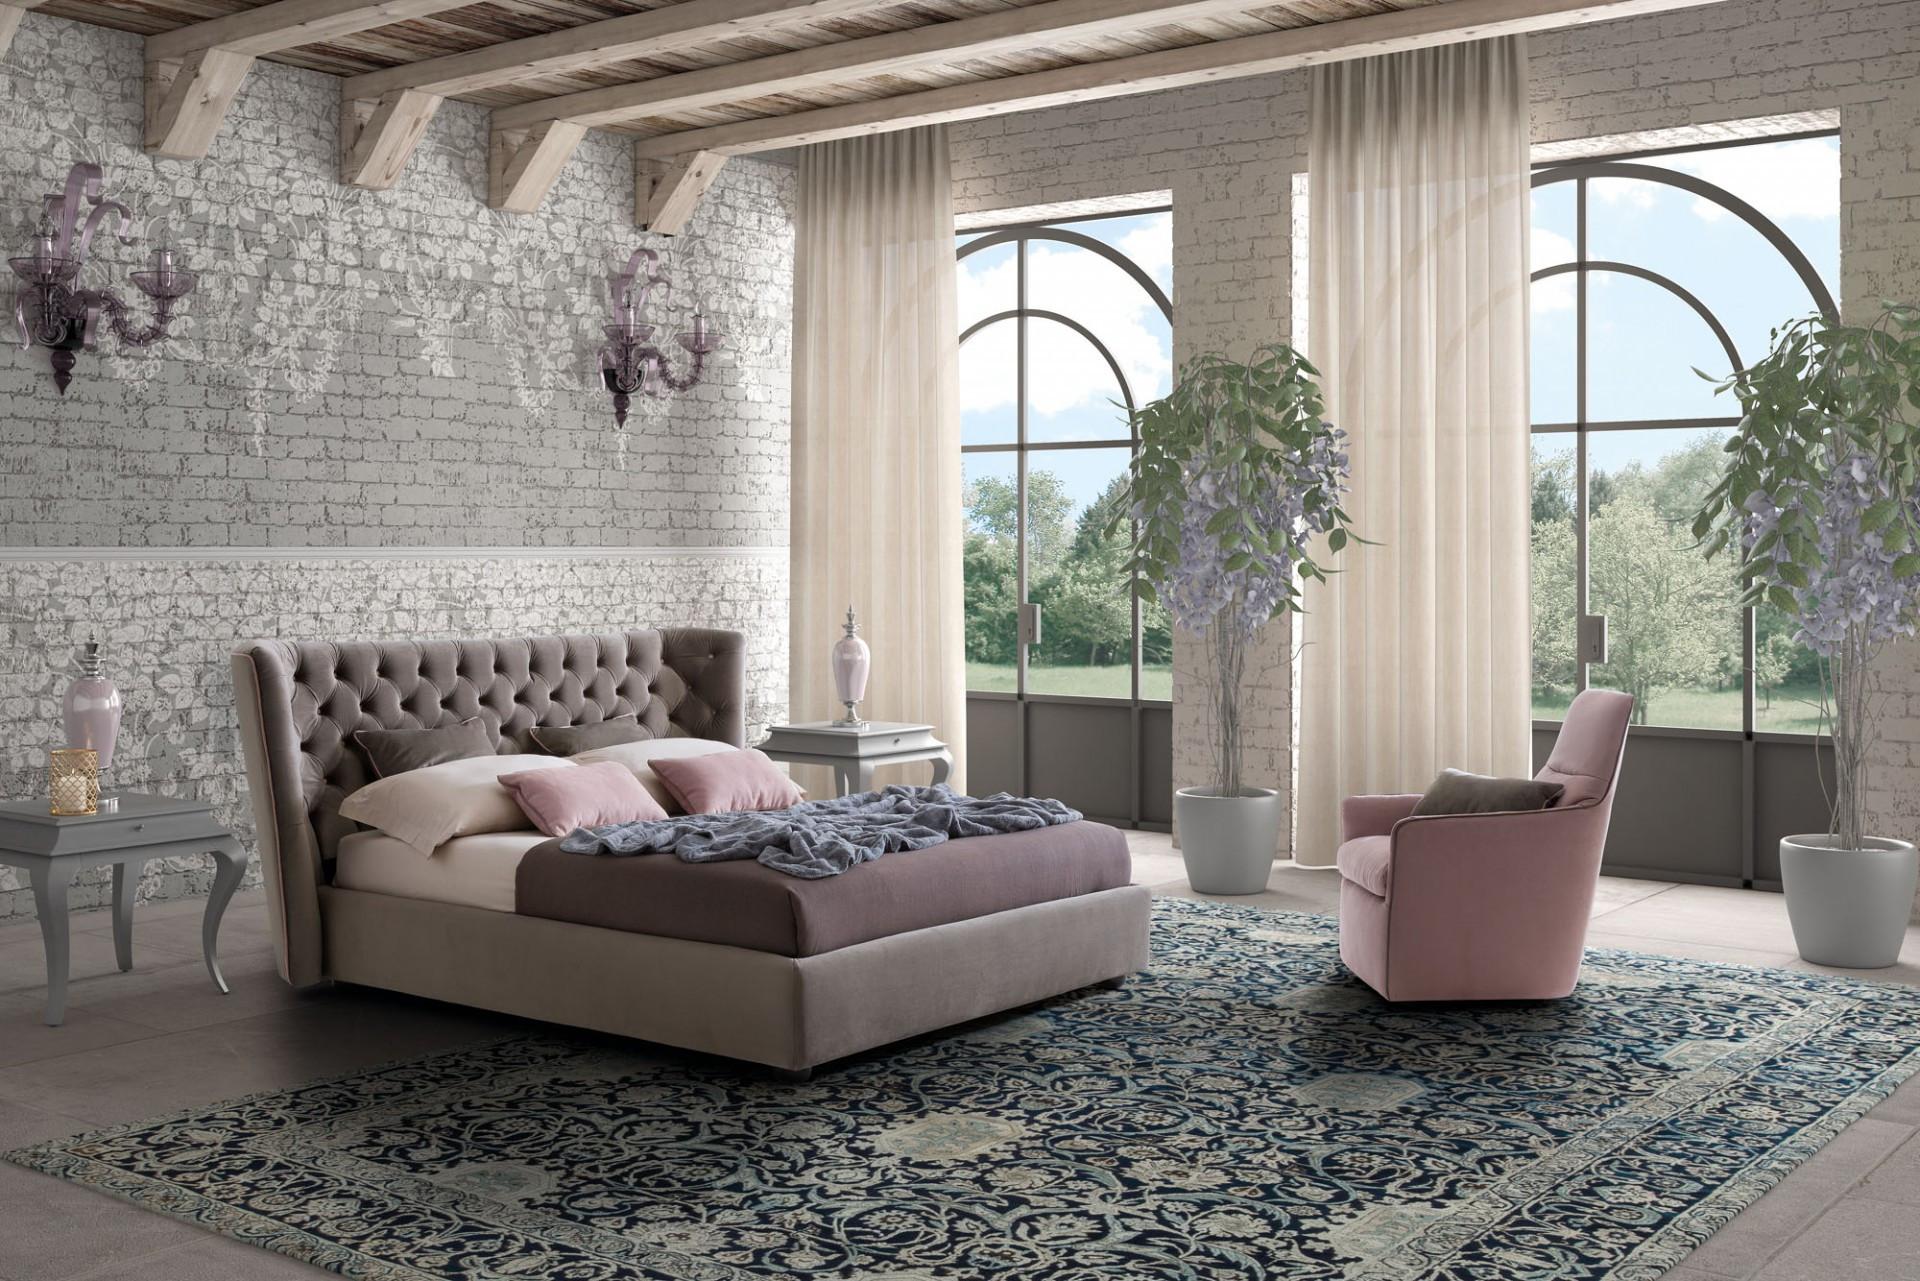 Beds Caravaggio Lecomfort